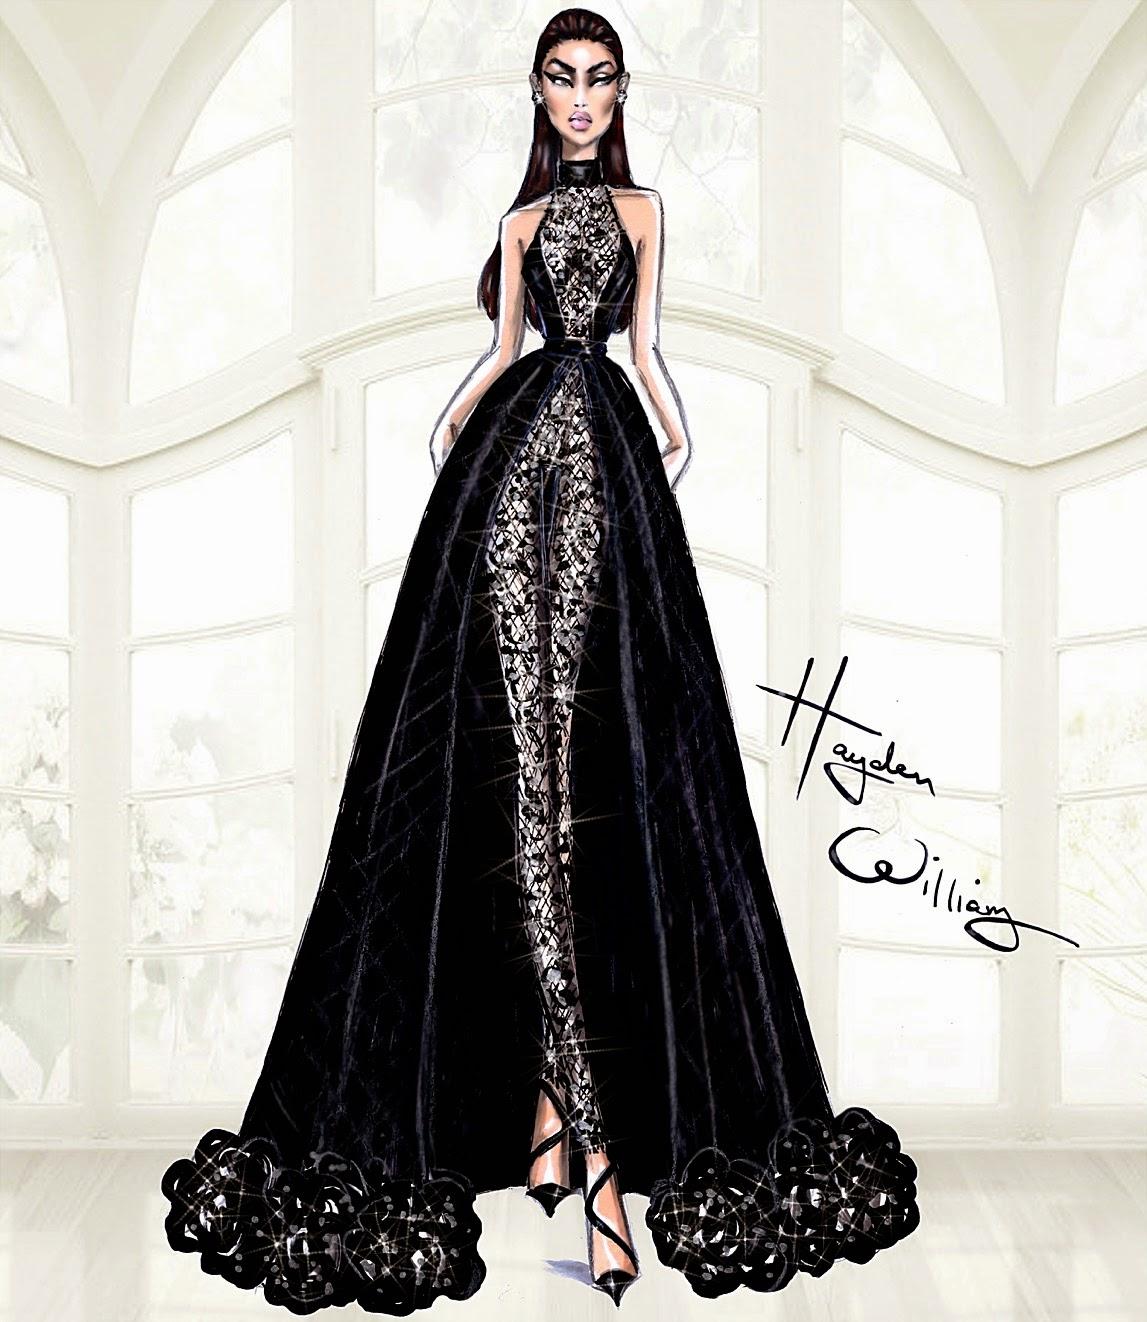 Hayden williams fashion illustrations hayden williams for Couture fashion designers